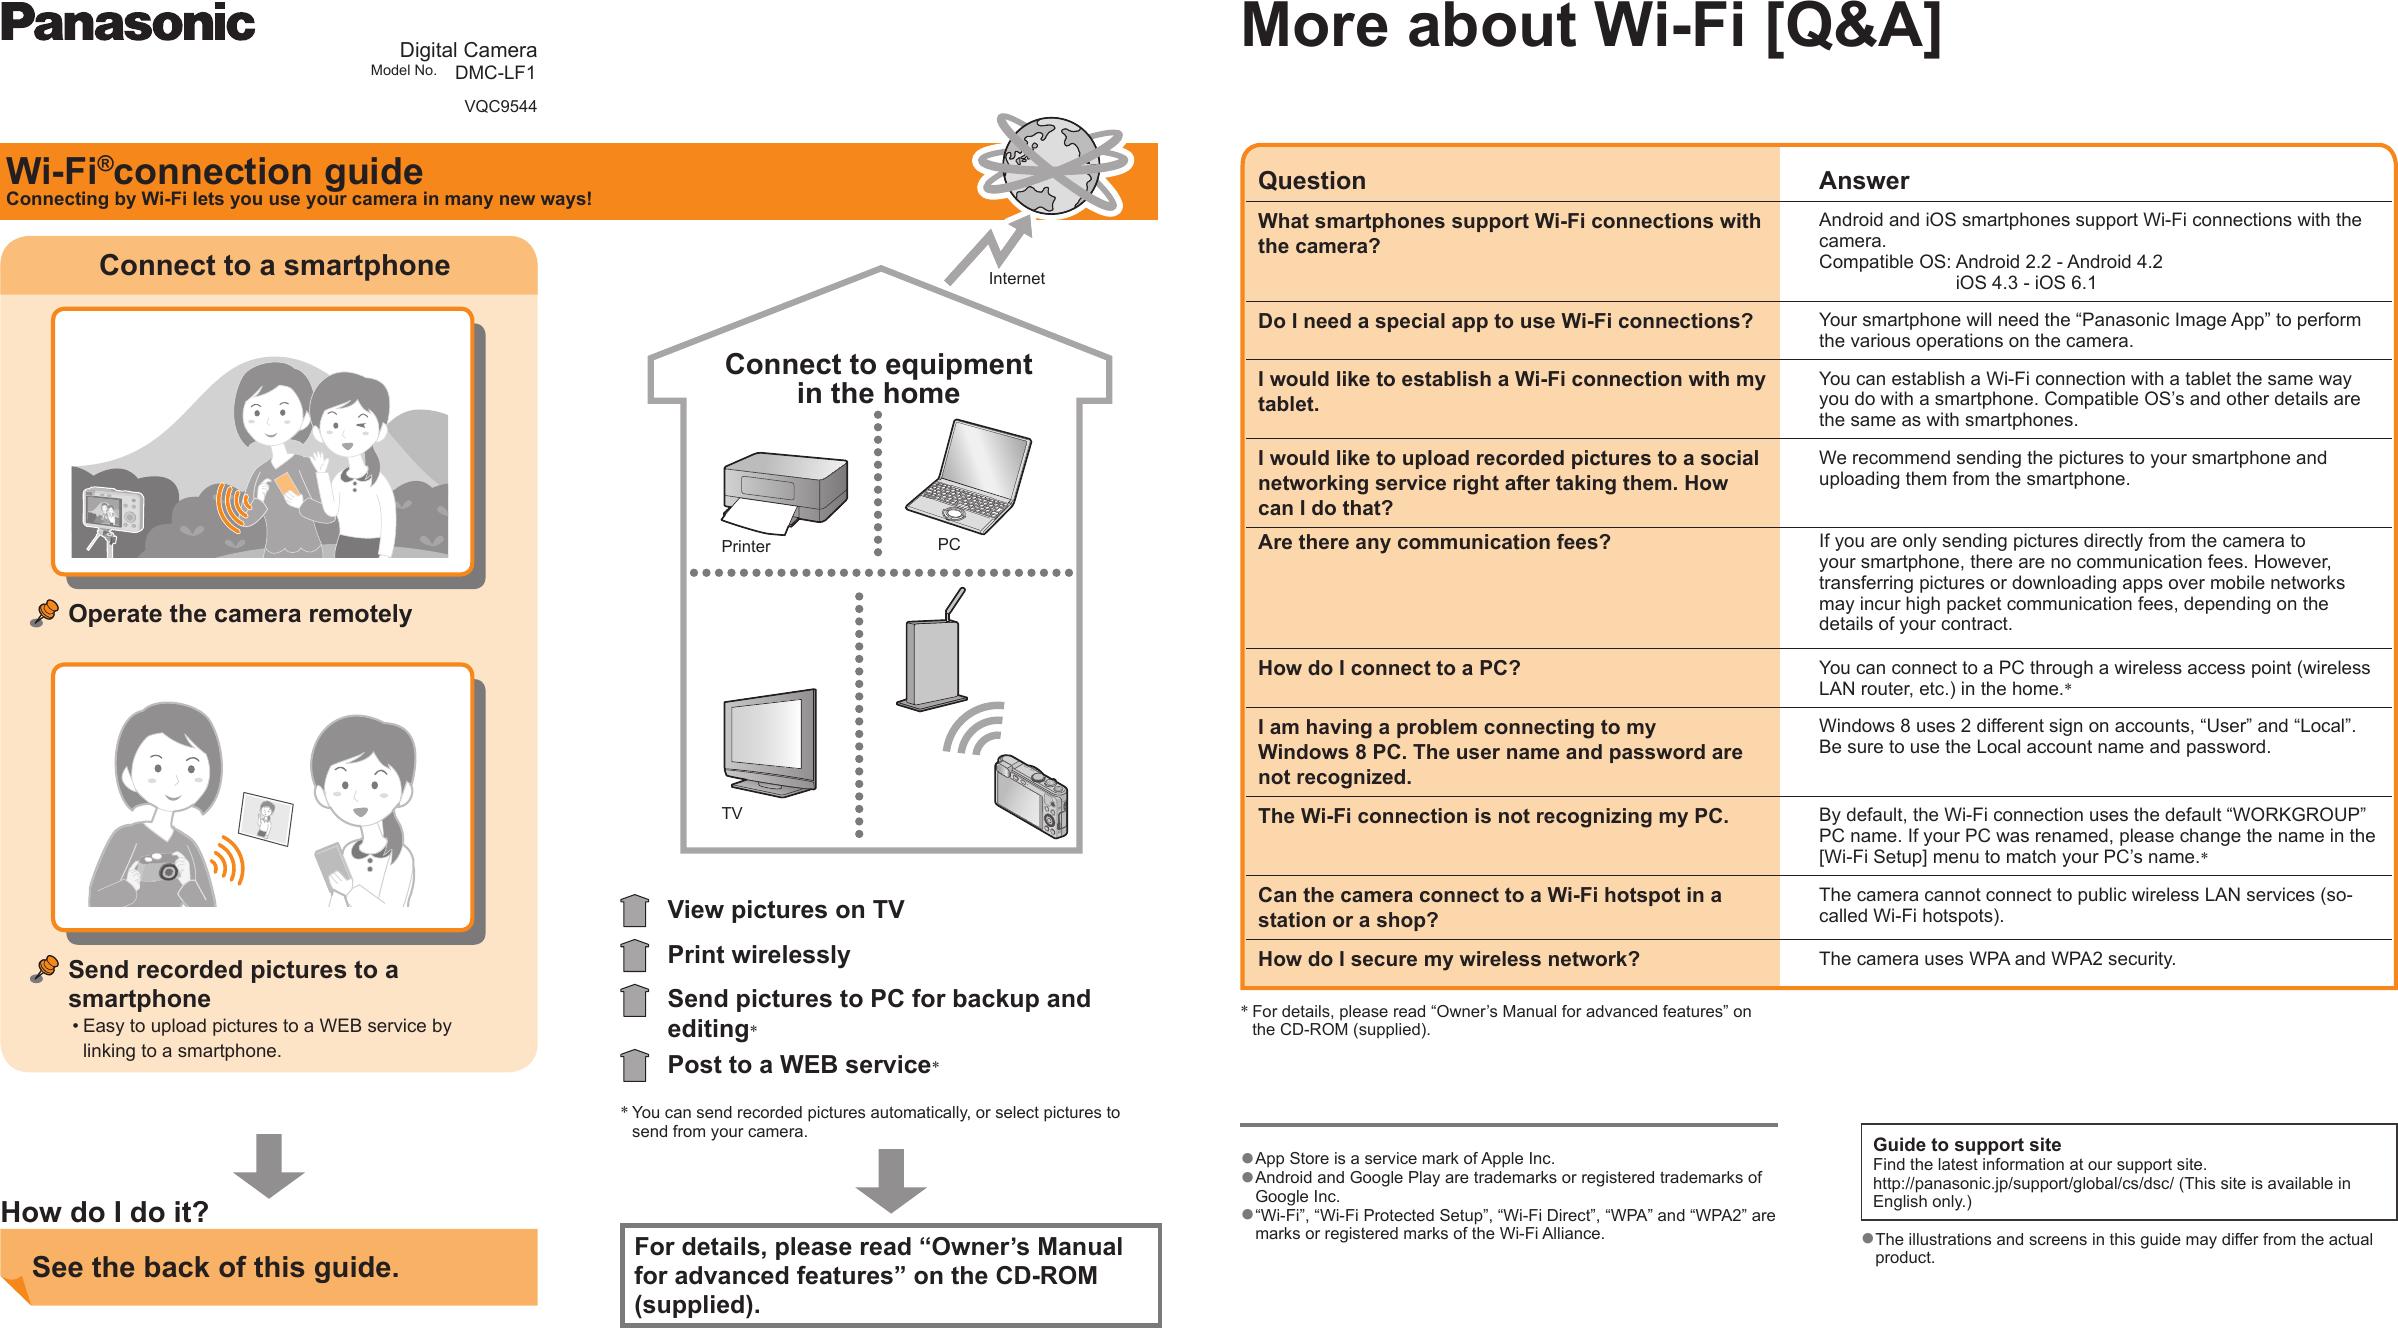 Panasonic Dmc Lf1 Wi Fi Connection Guide Fi_guide_LF1_P_Eng